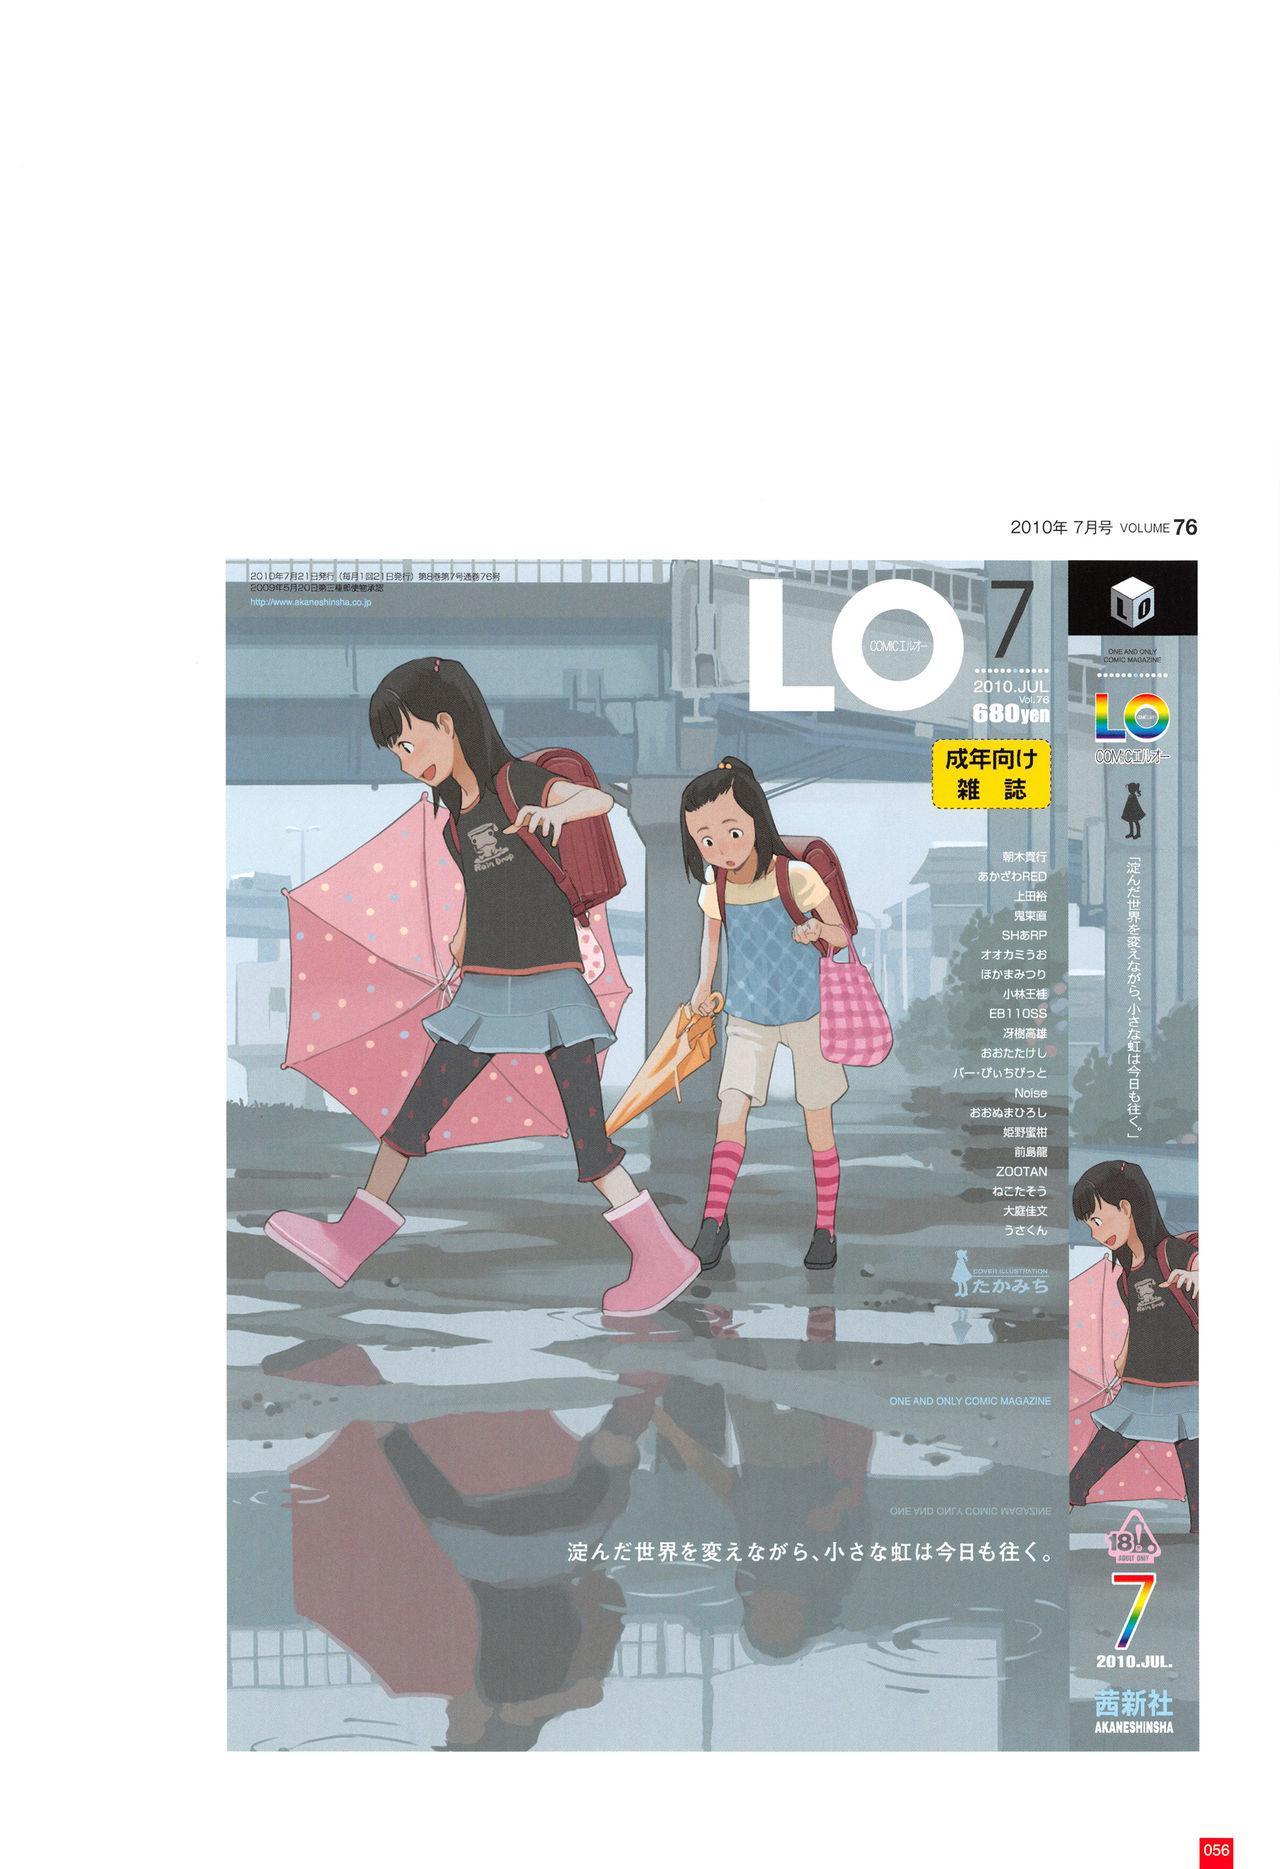 LO Artbook 2-A TAKAMICHI LOOP WORKS 58